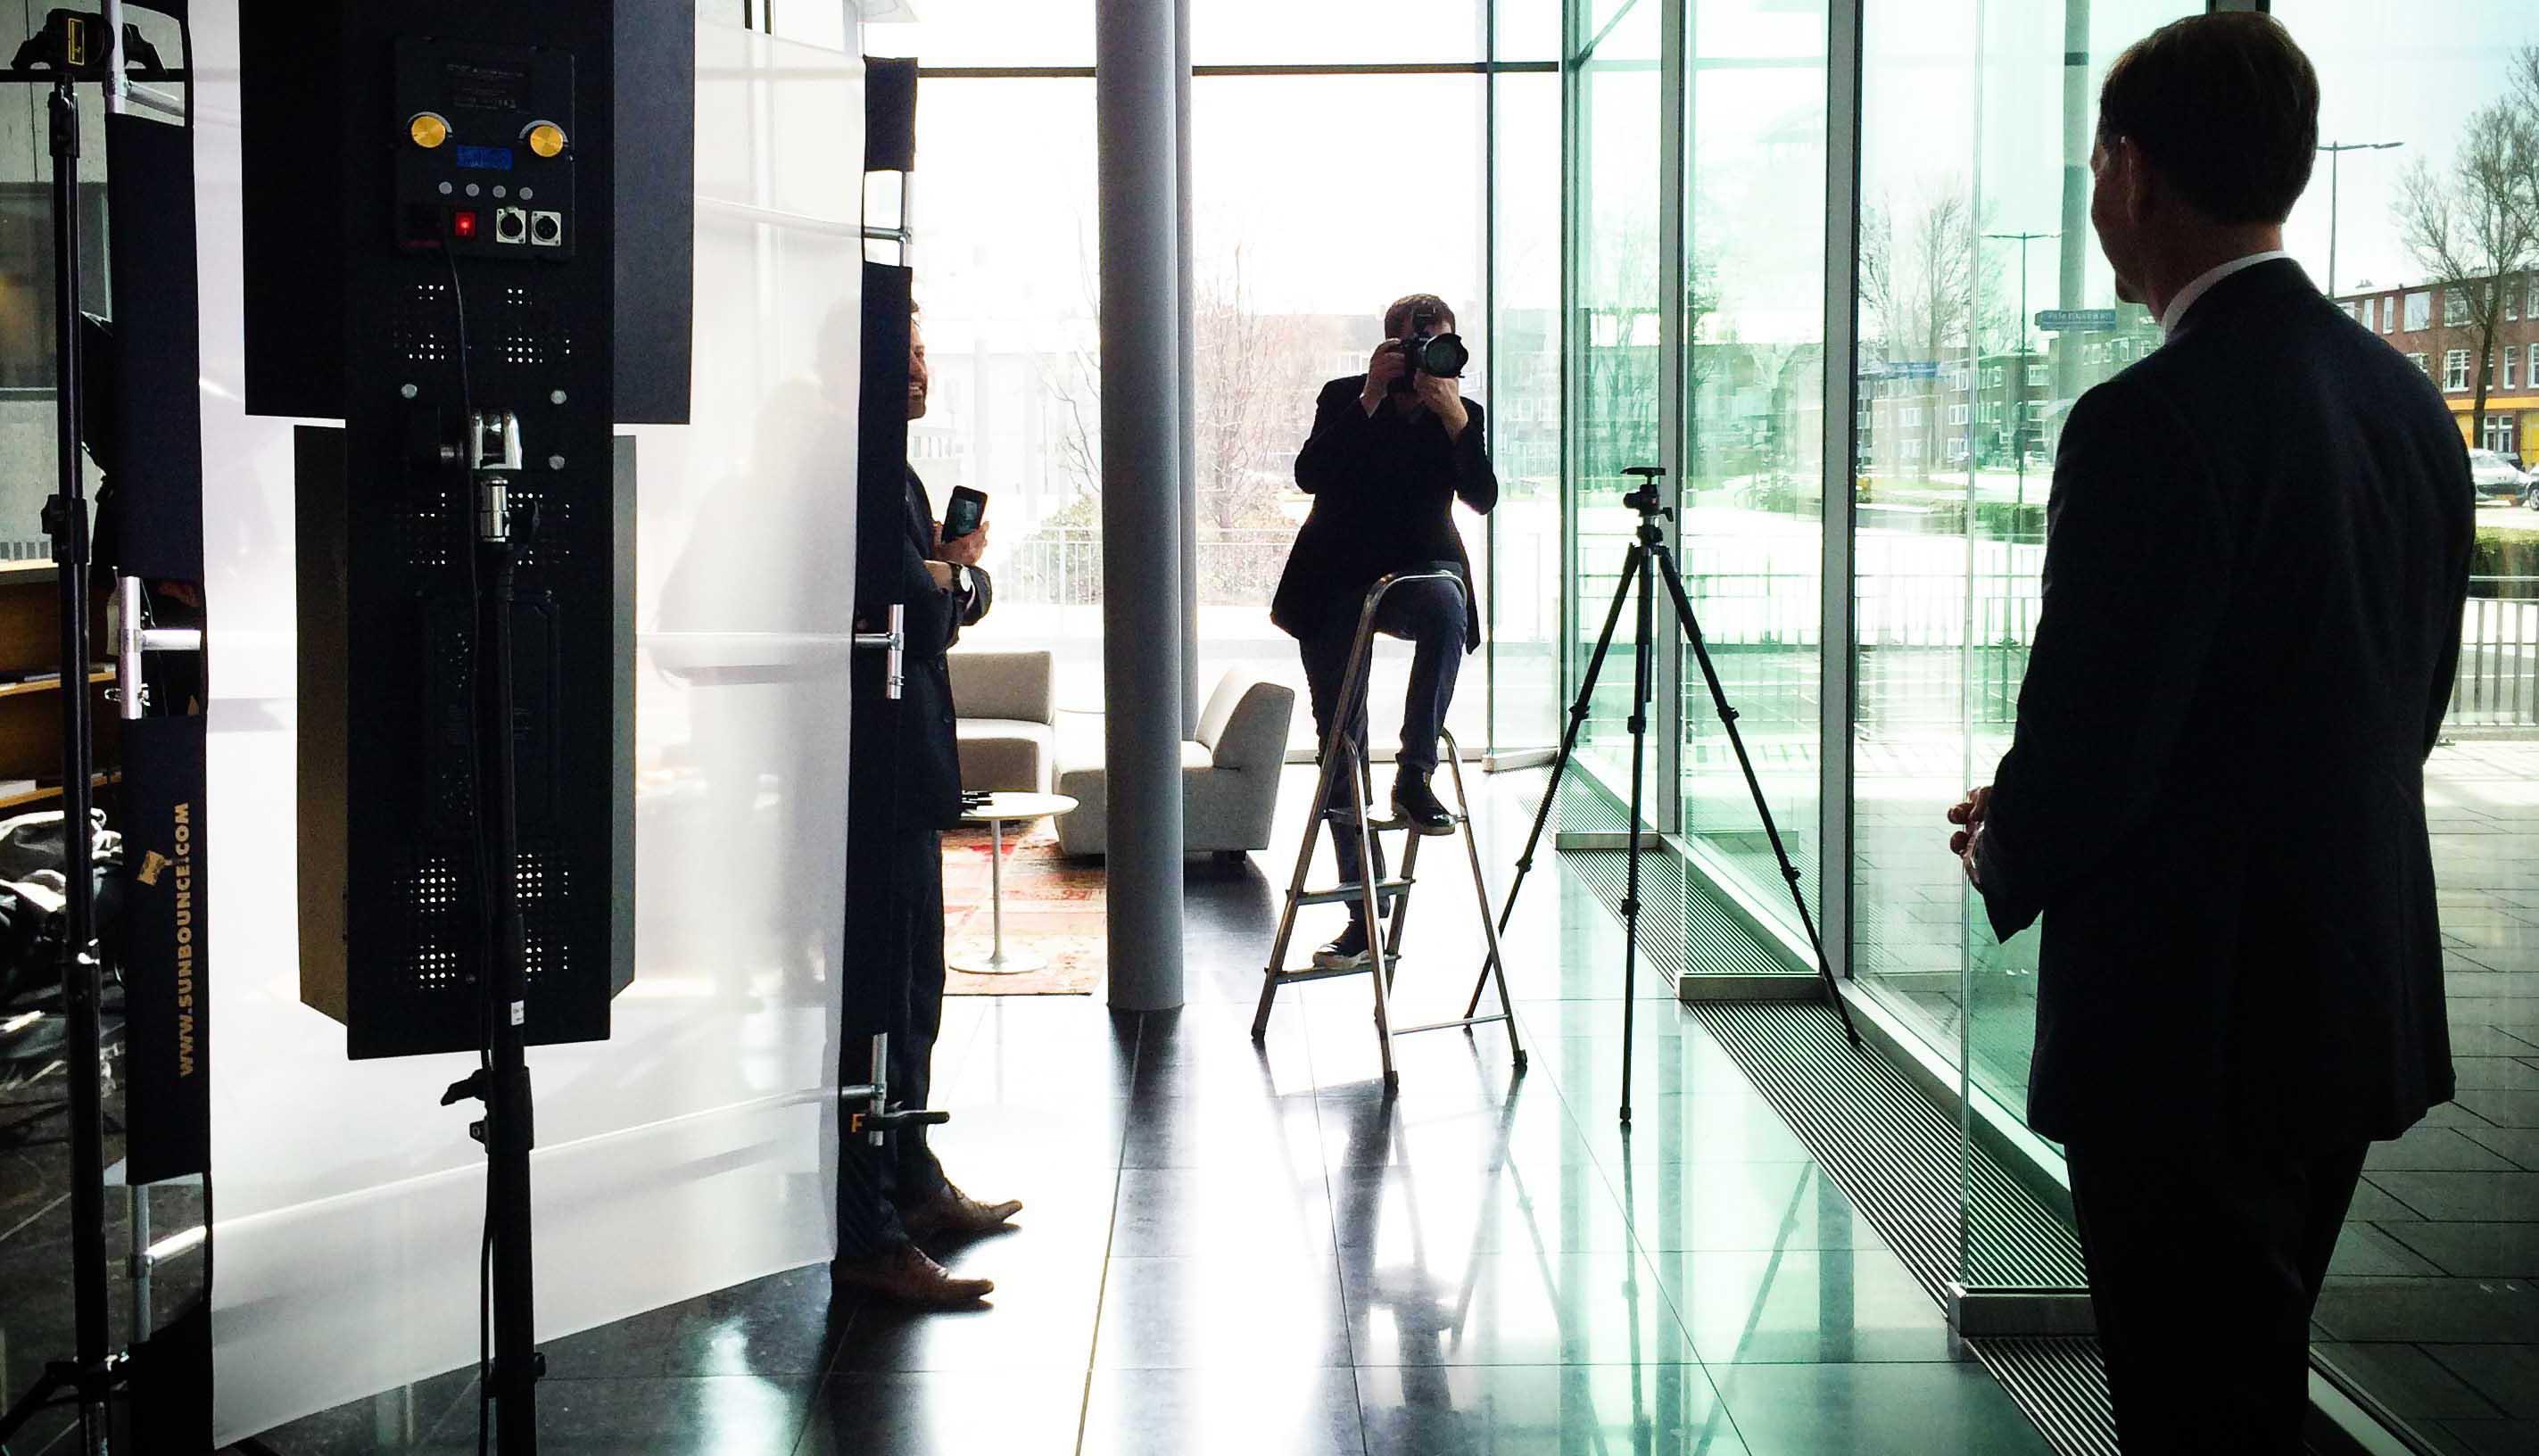 zakelijke fotoshoot organiseren | bedrijfsfotografie amsterdam